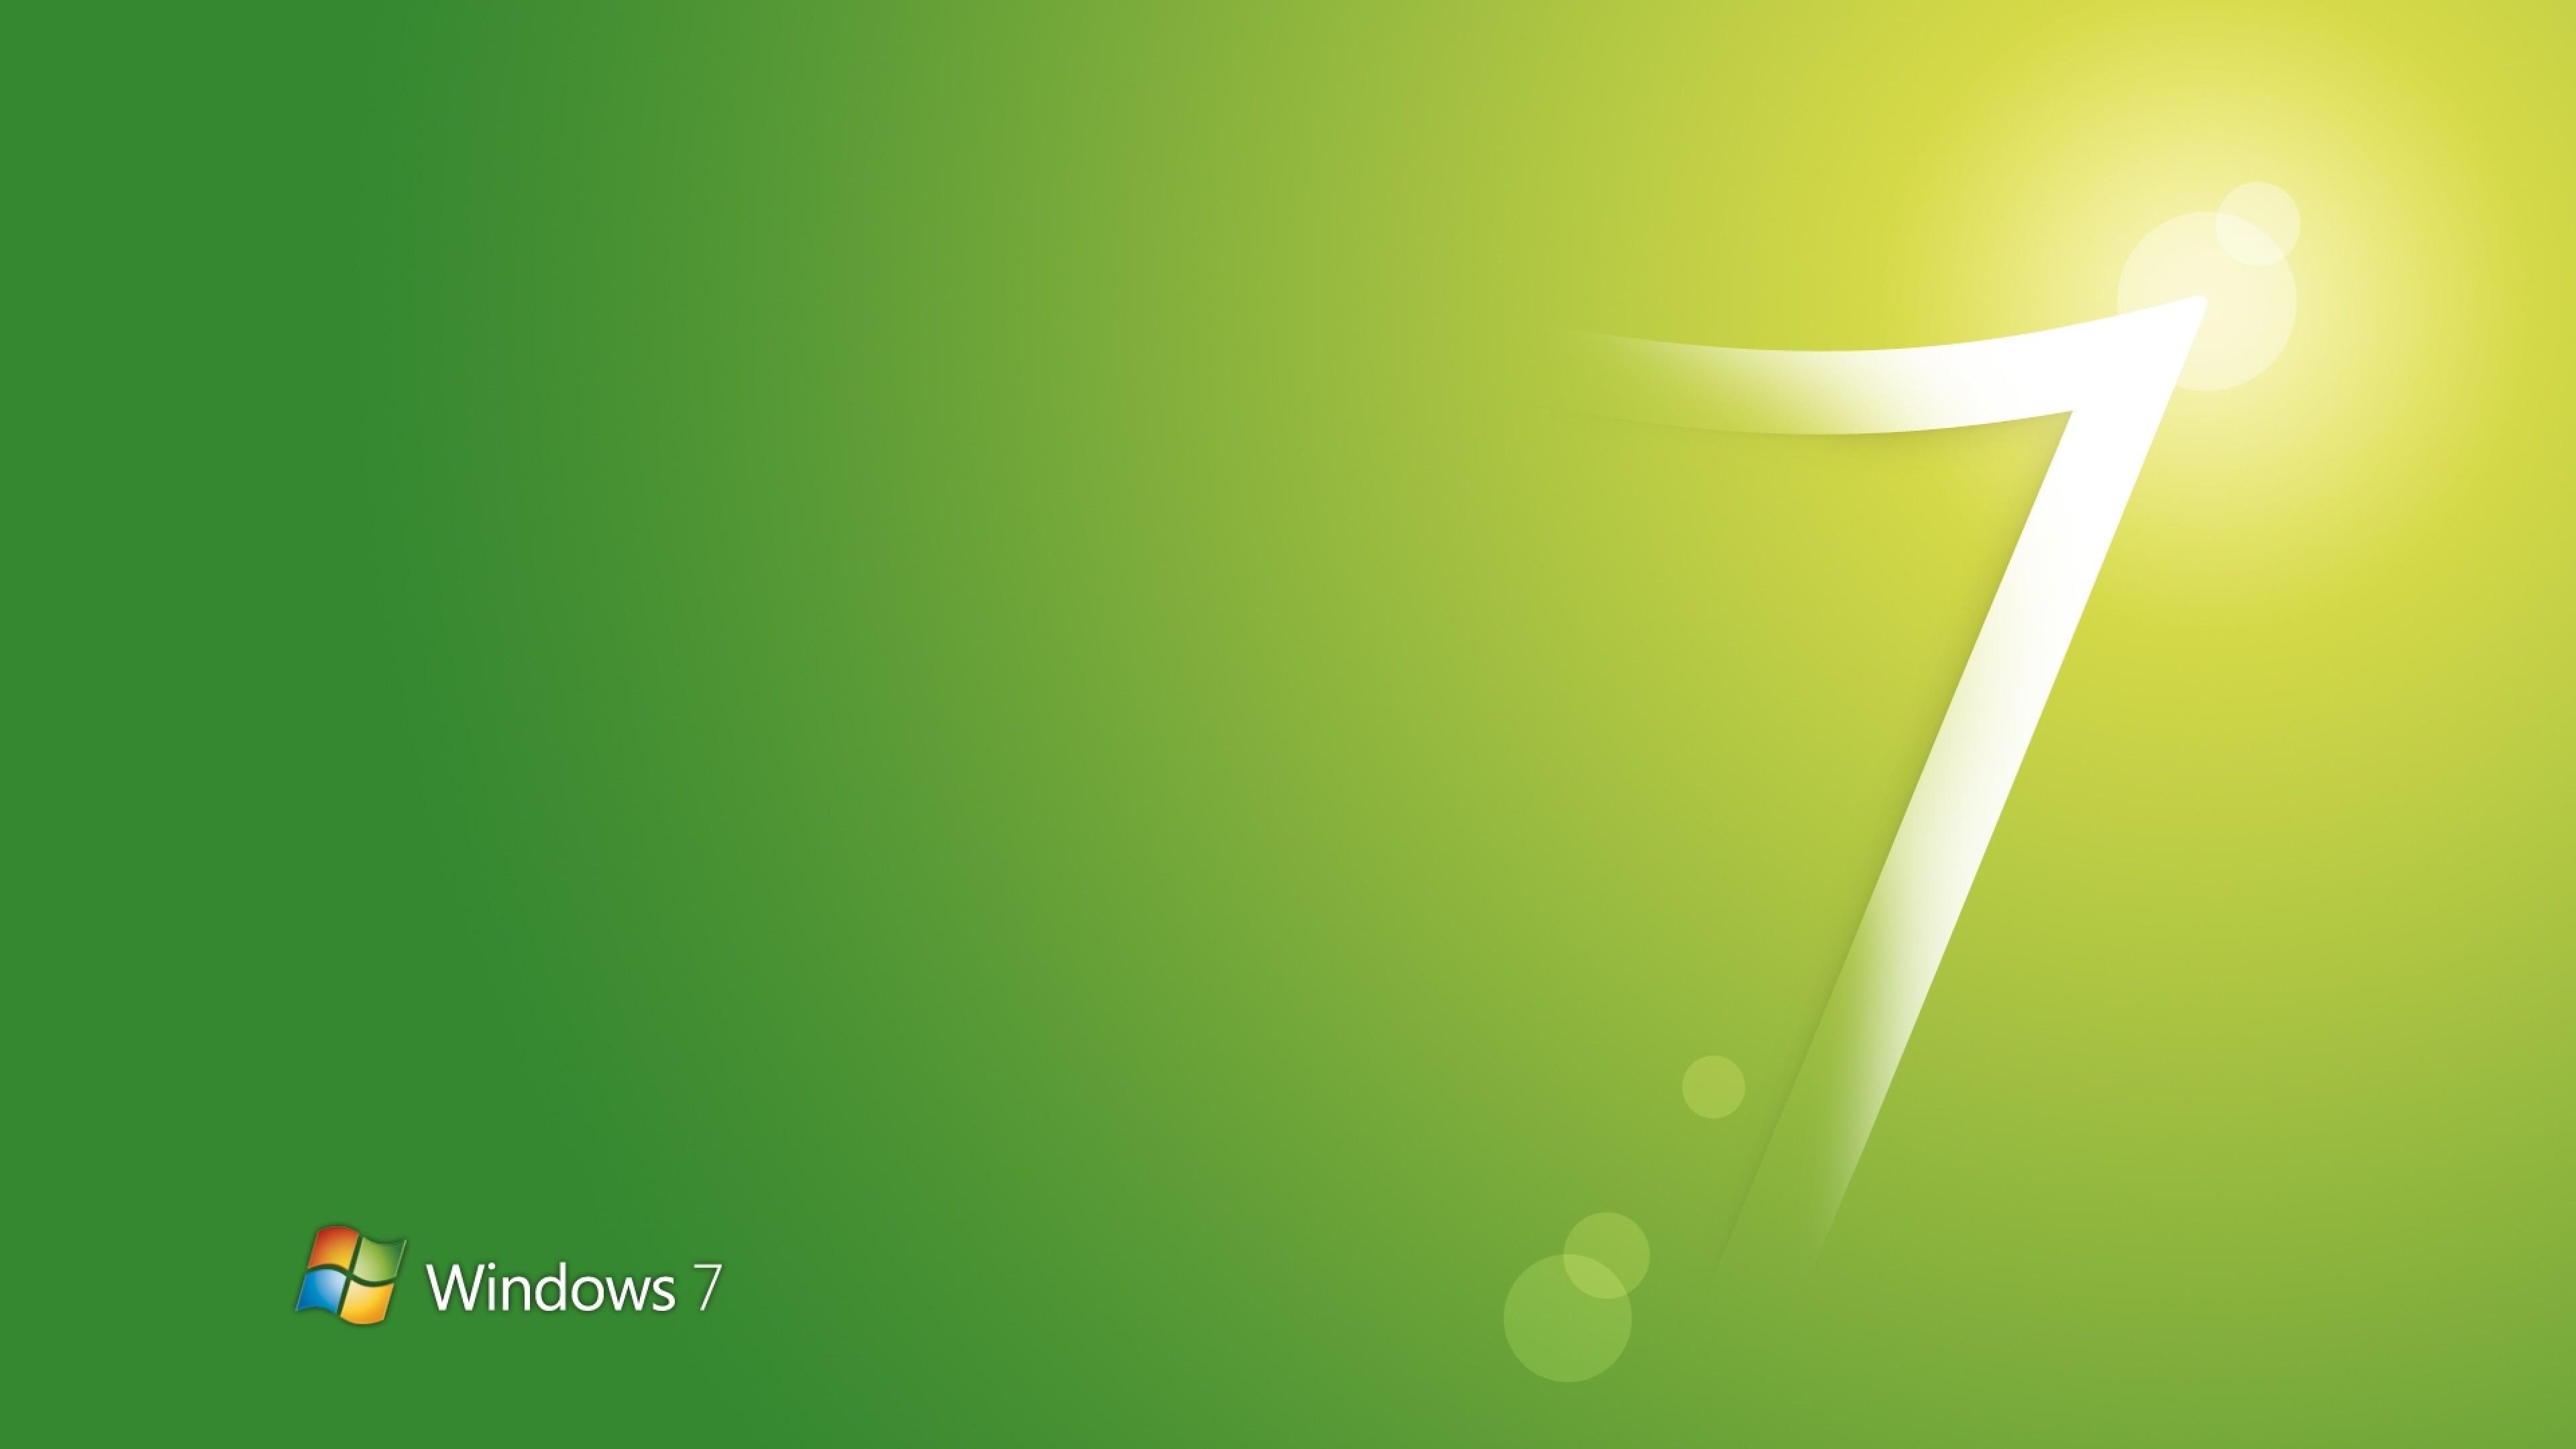 Wallpaper windows 7, green, white, os